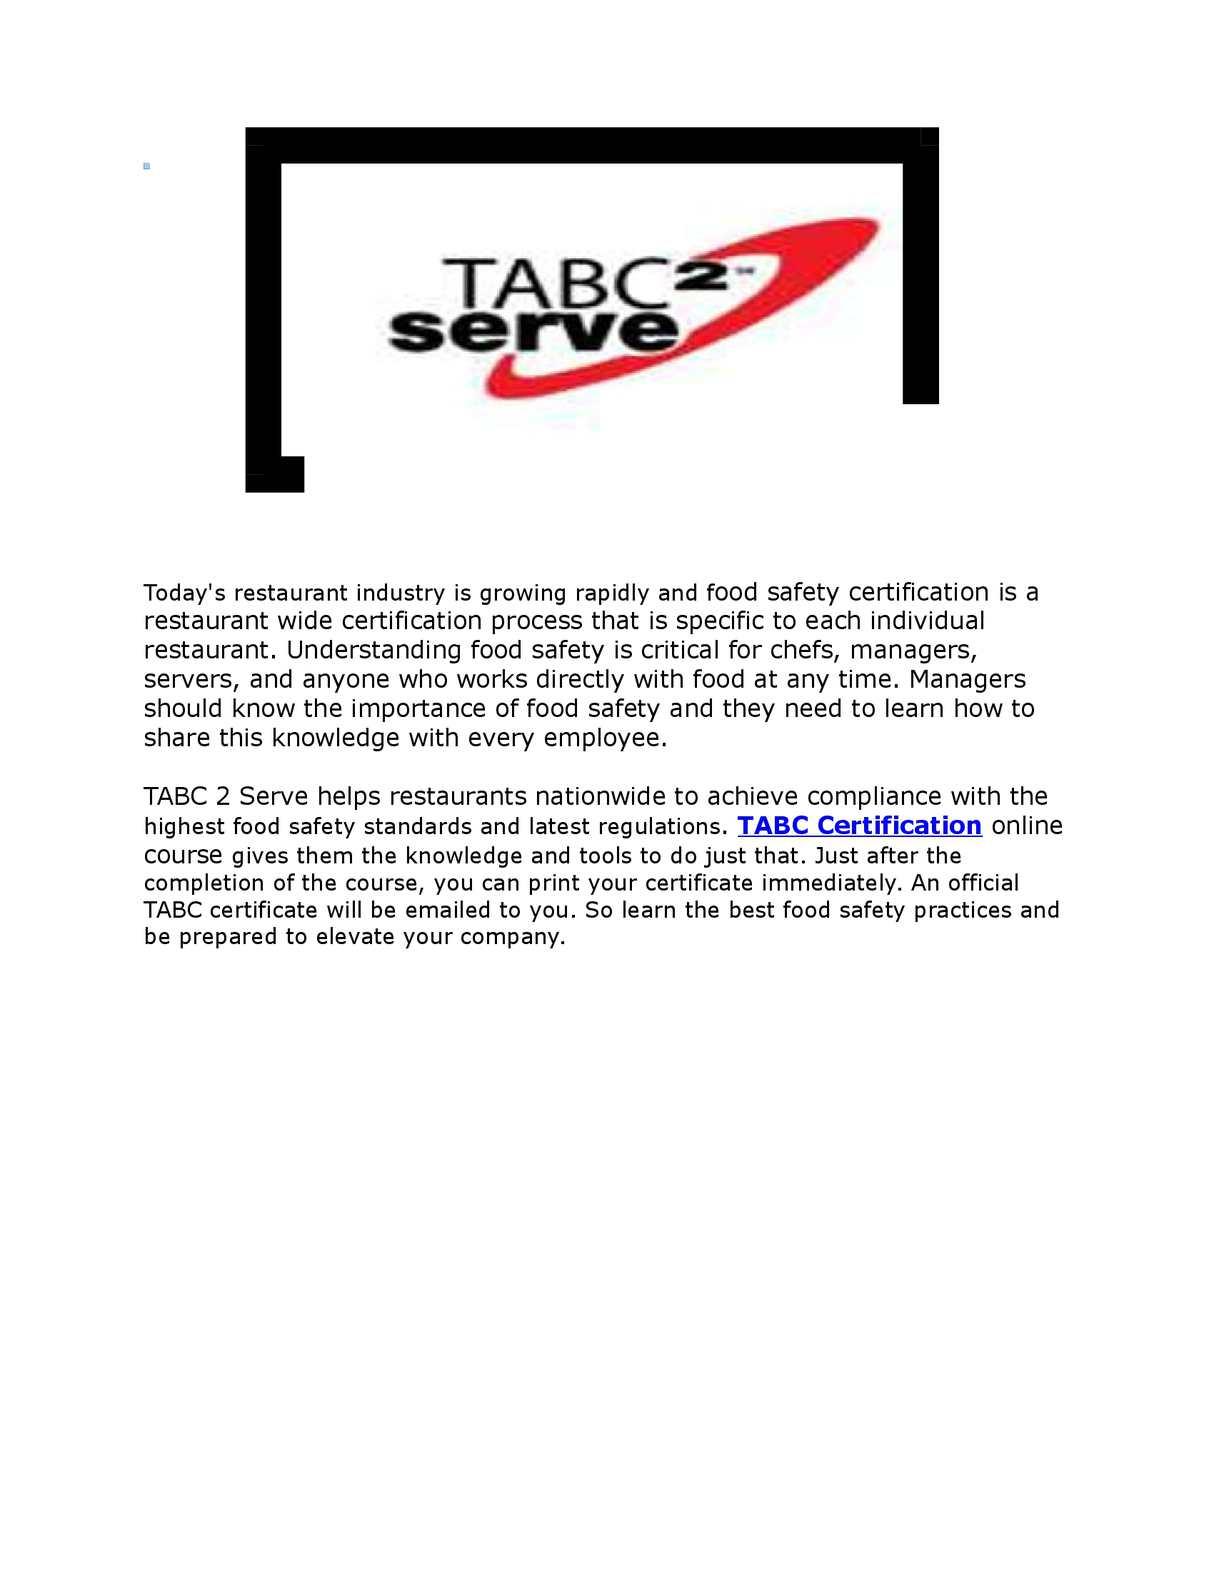 Calamo Tabc Certification